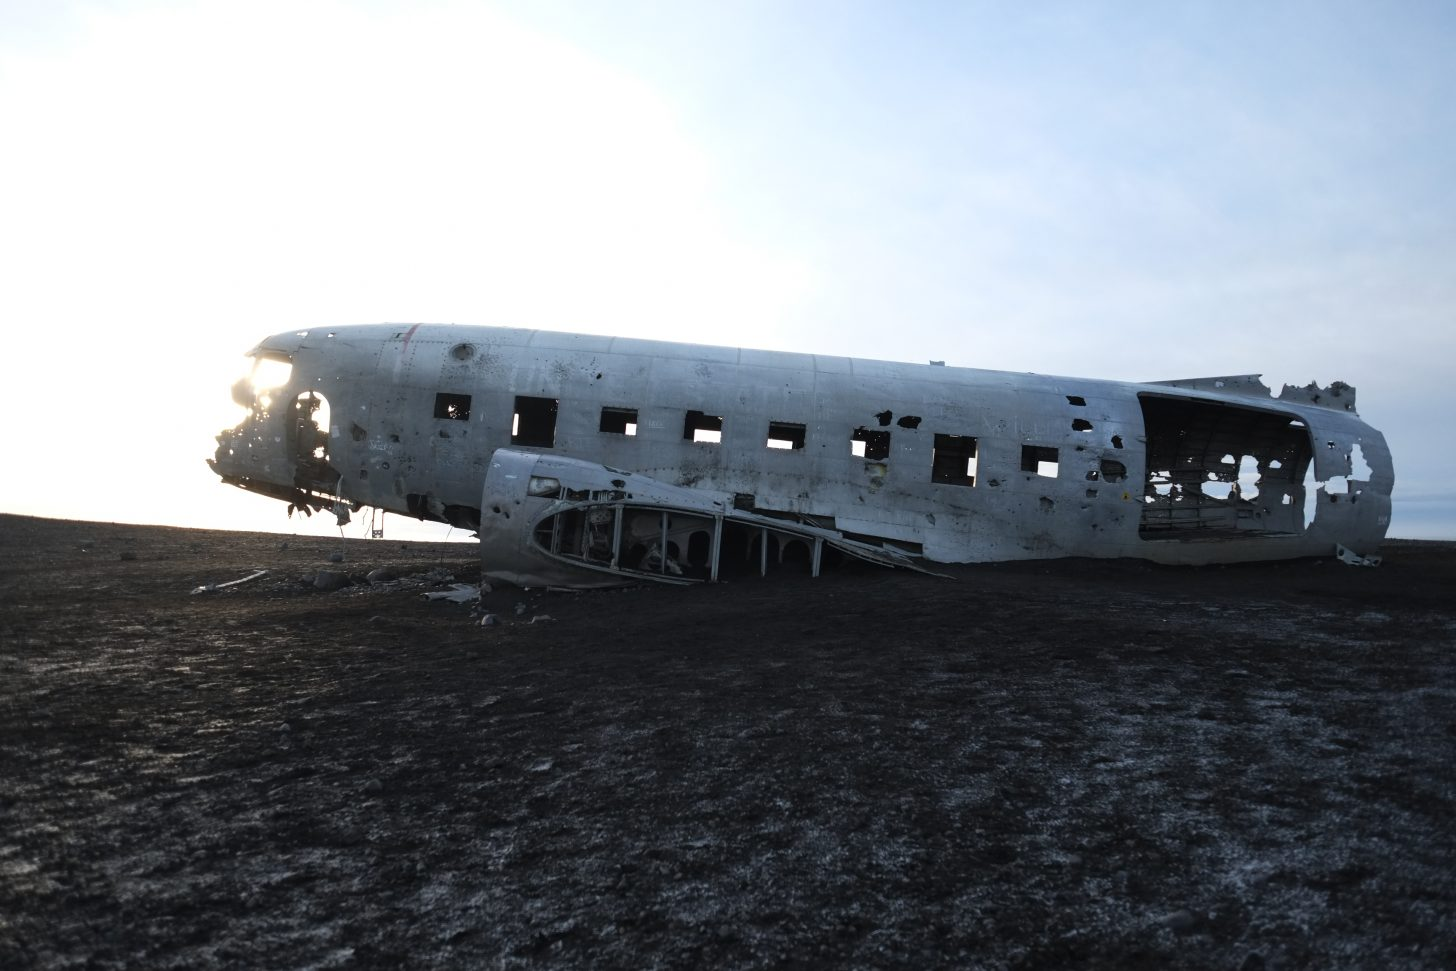 Un avion de l'armée américaine en Islande